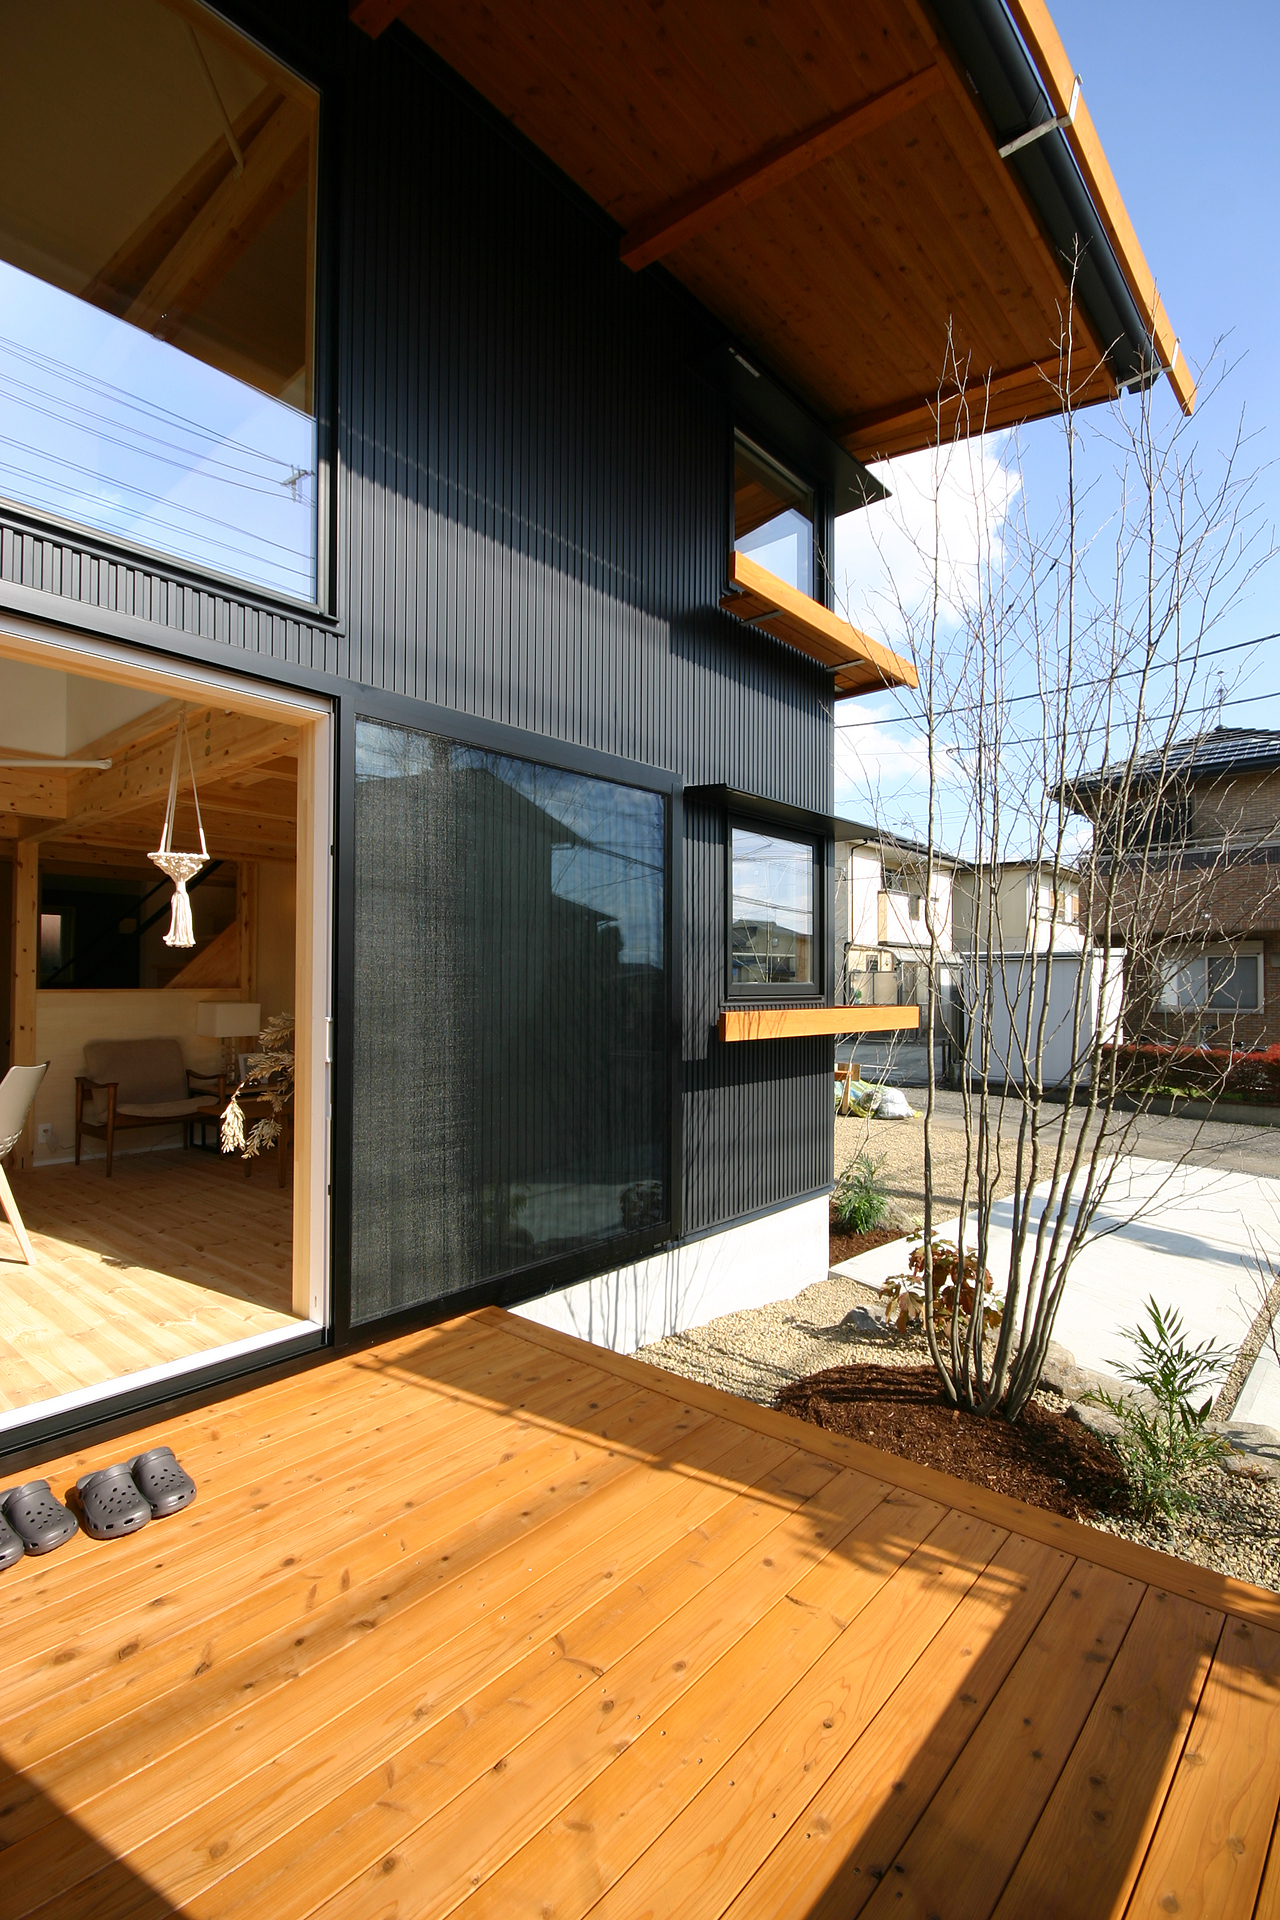 BEAHAUS|N-SERIES ウッドデッキ|栃木県宇都宮市の注文住宅 ネクストハウスデザインの施工例